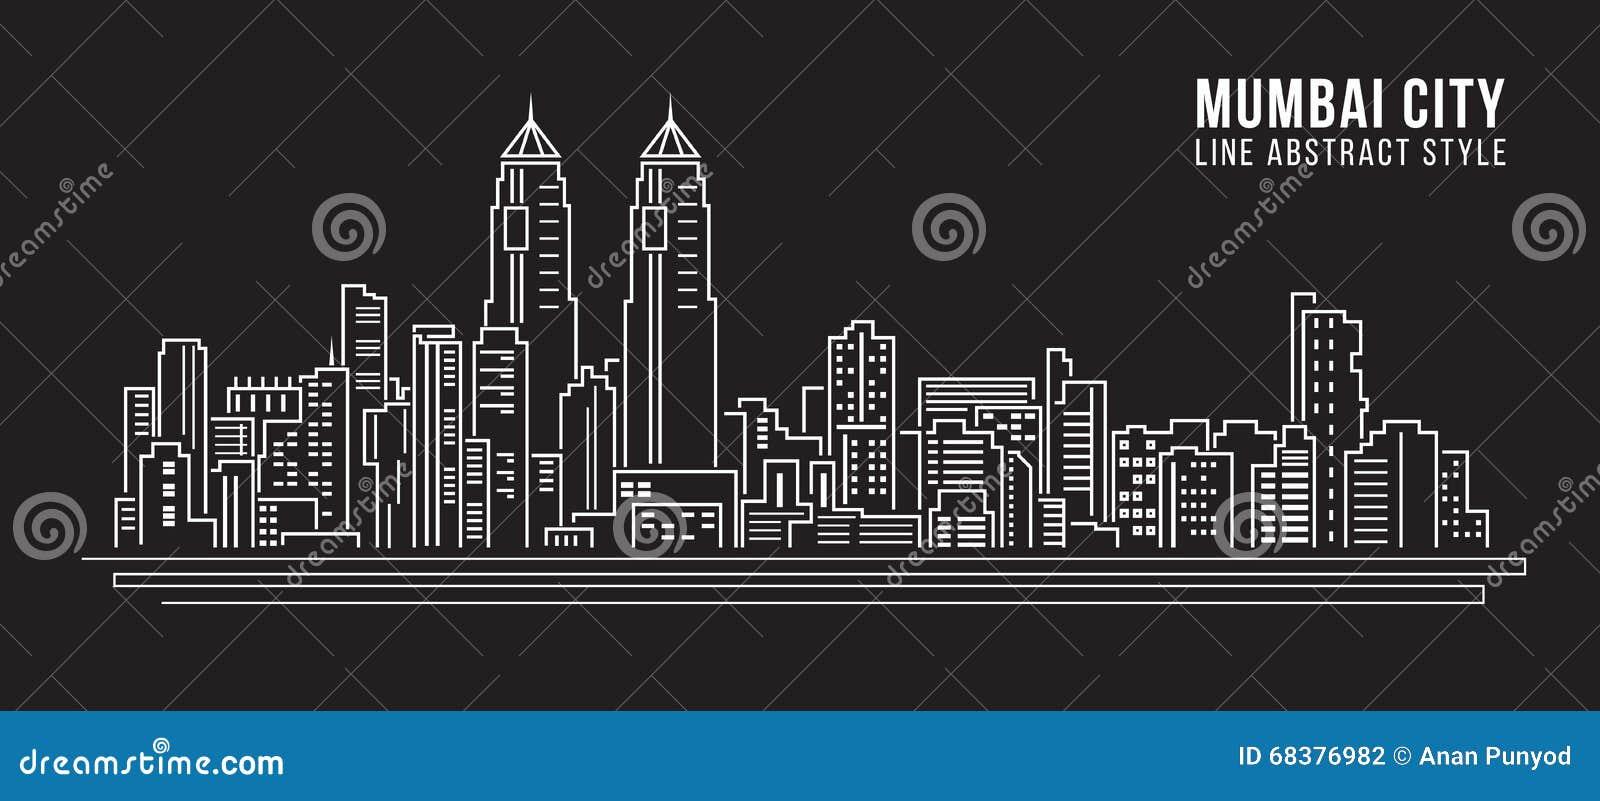 Line Art Illustration Style : Cityscape building line art vector illustration design mumbai city